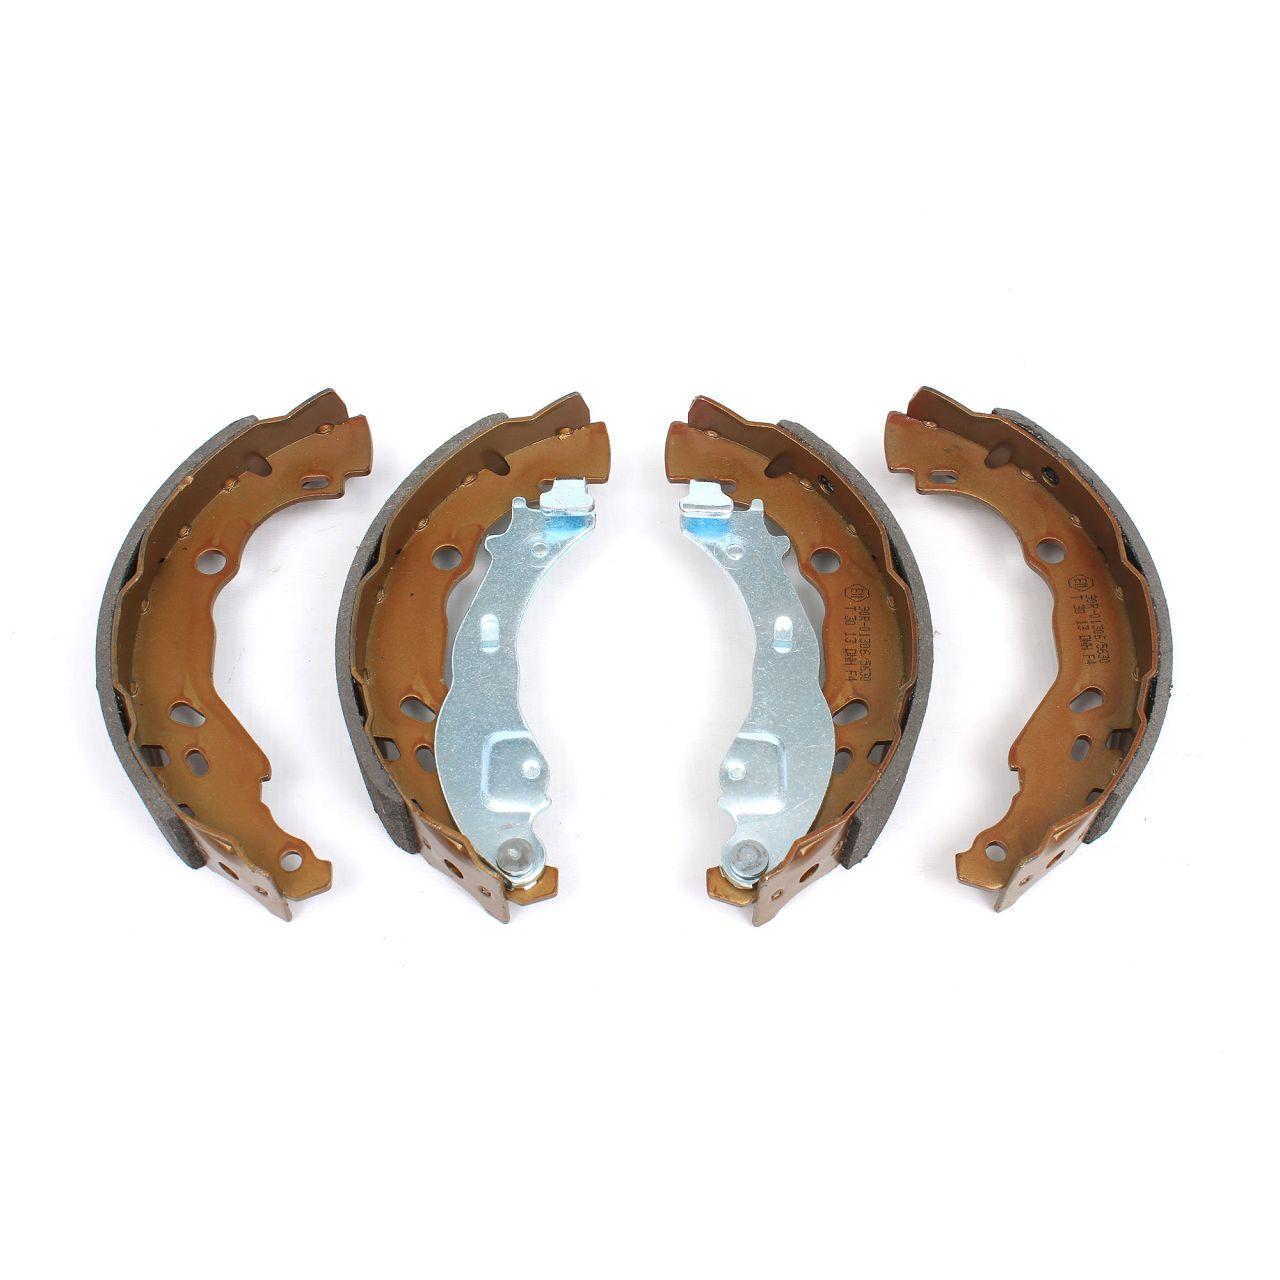 ZIMMERMANN Bremsbacken CITROEN C2 C3 I + II Pluriel LANCIA Ypsilon PEUGEOT 1007 hinten